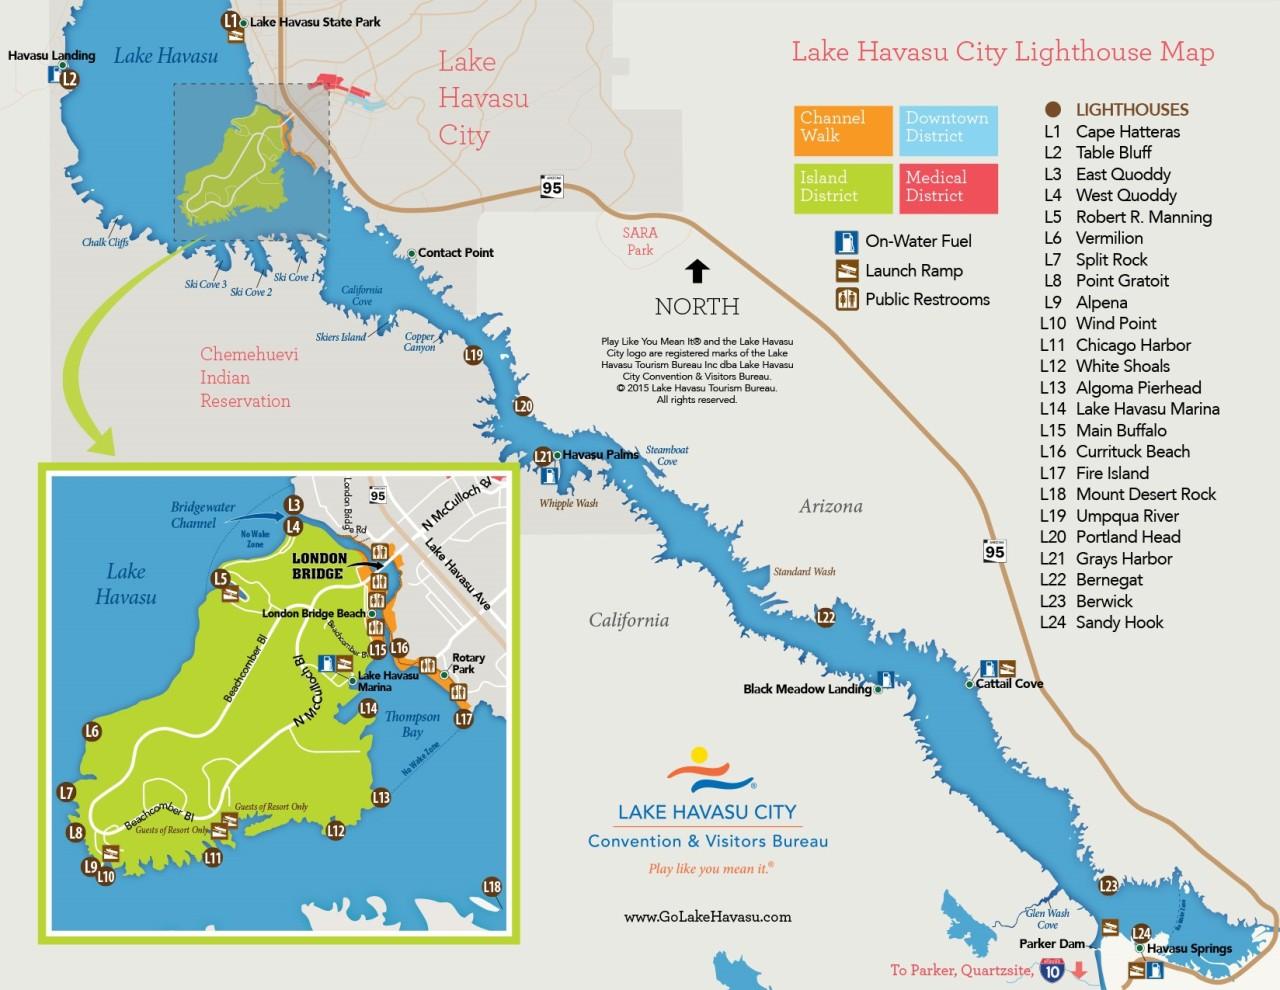 LHCCVB_Lighthouse_Map